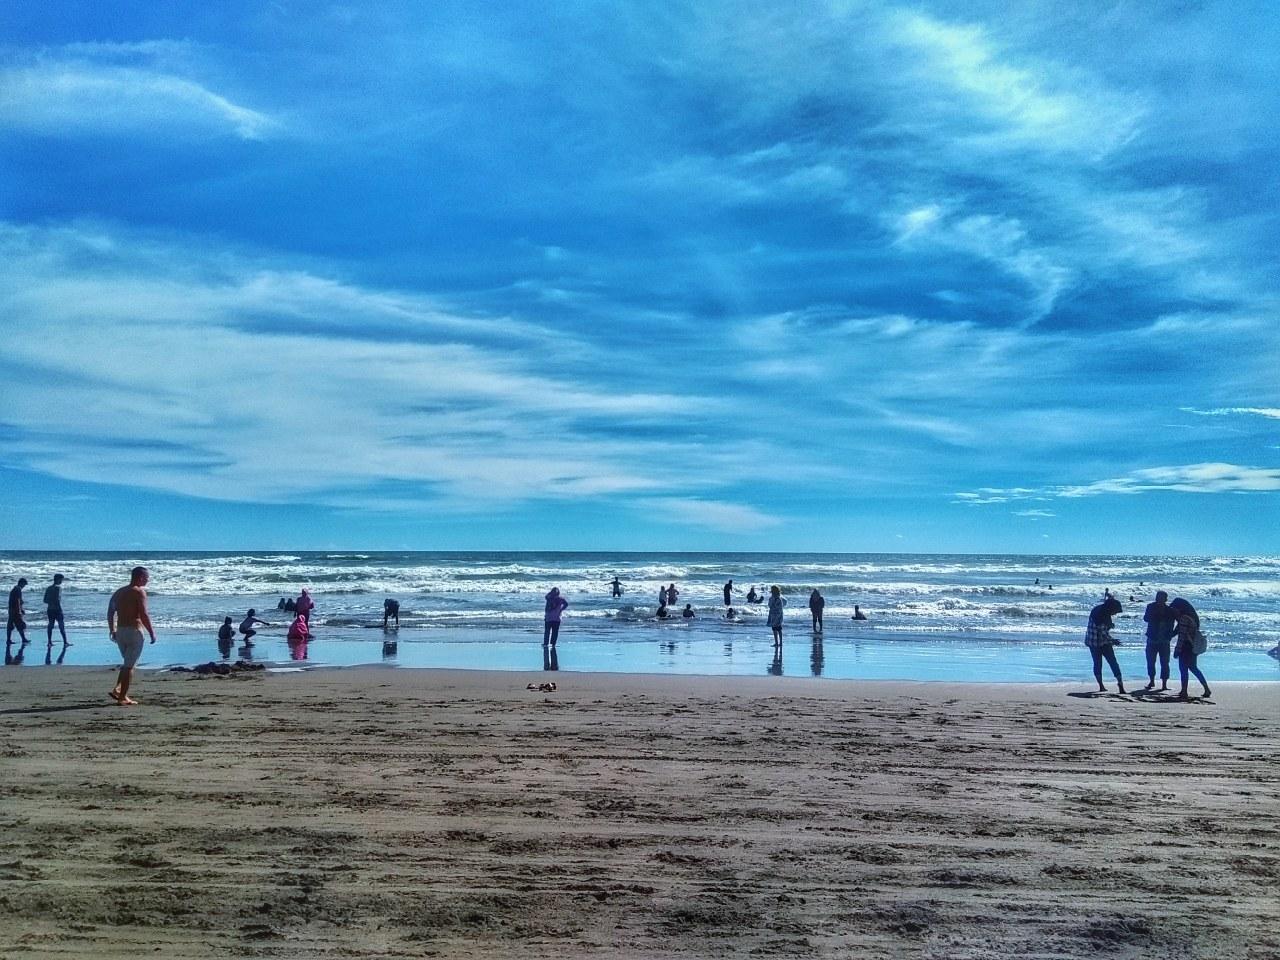 vitamin sea | Snapseed apk - Fotografi - Mi Community - Xiaomi